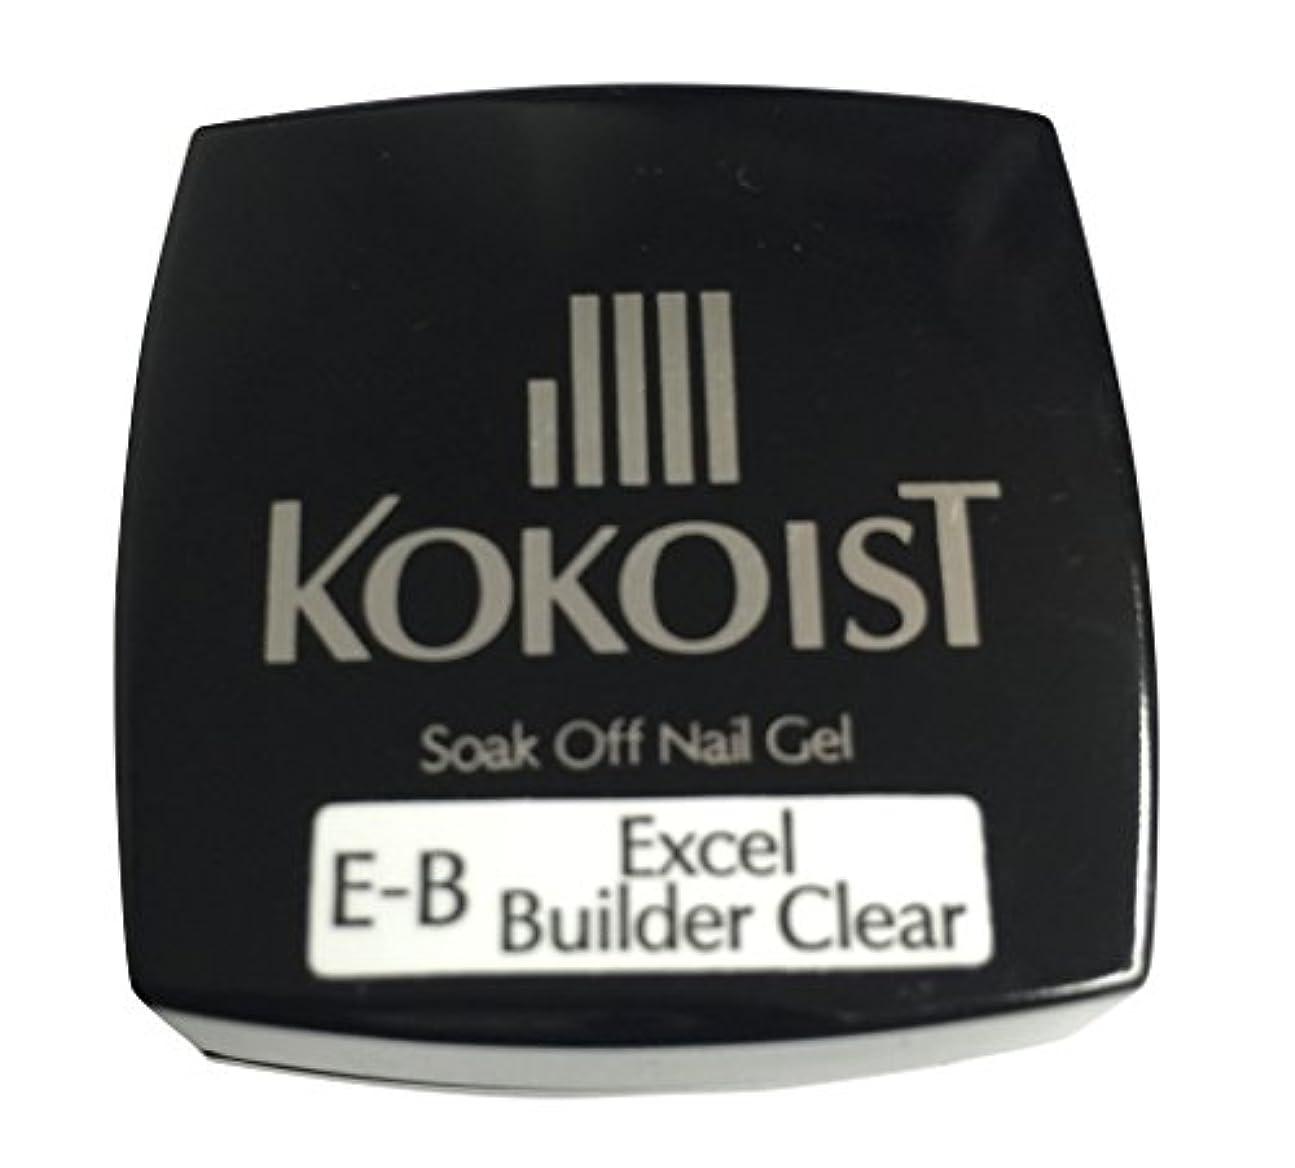 KOKOIST(ココイスト) ソークオフクリアジェル エクセルビルダー  4g